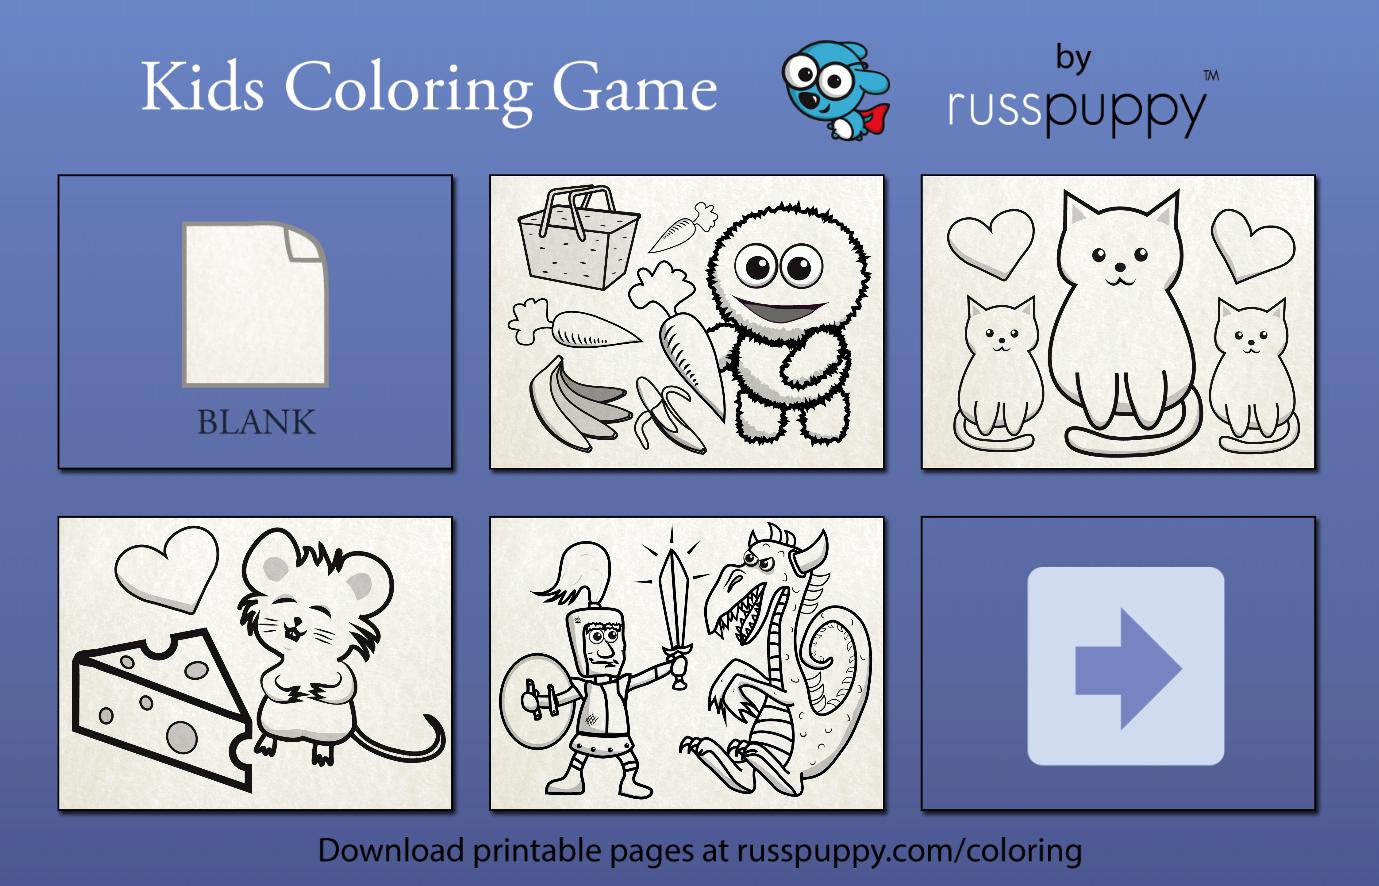 Kids Coloring Game Russpuppy Screenshot